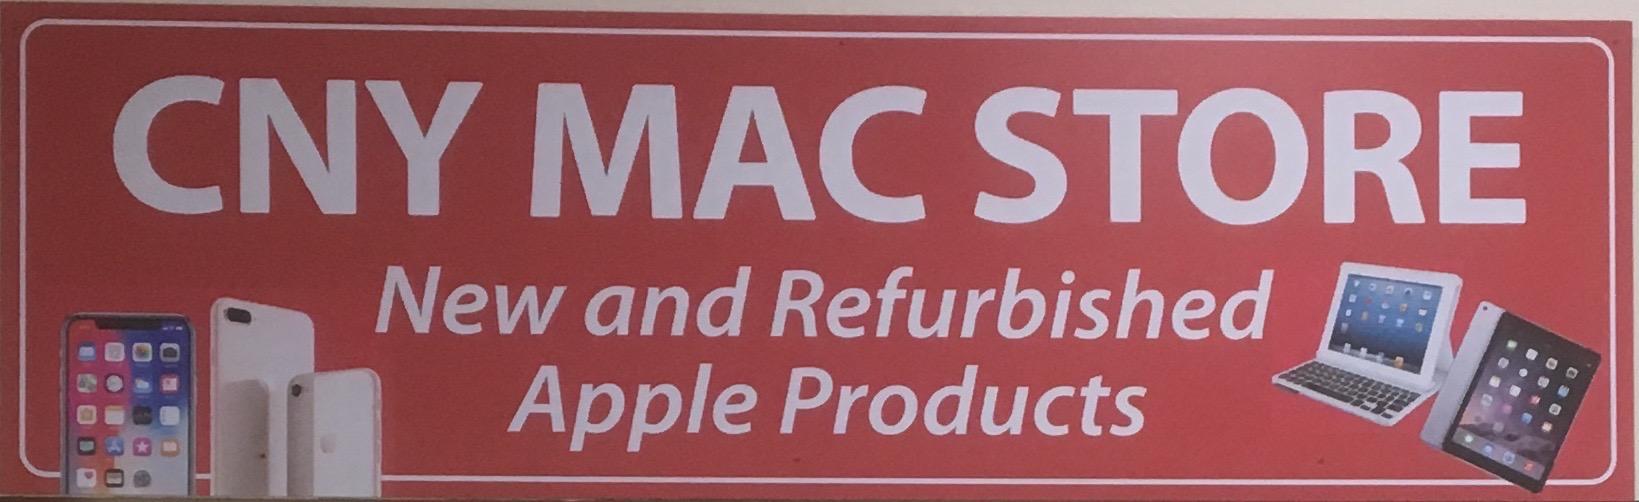 CNY Mac Store